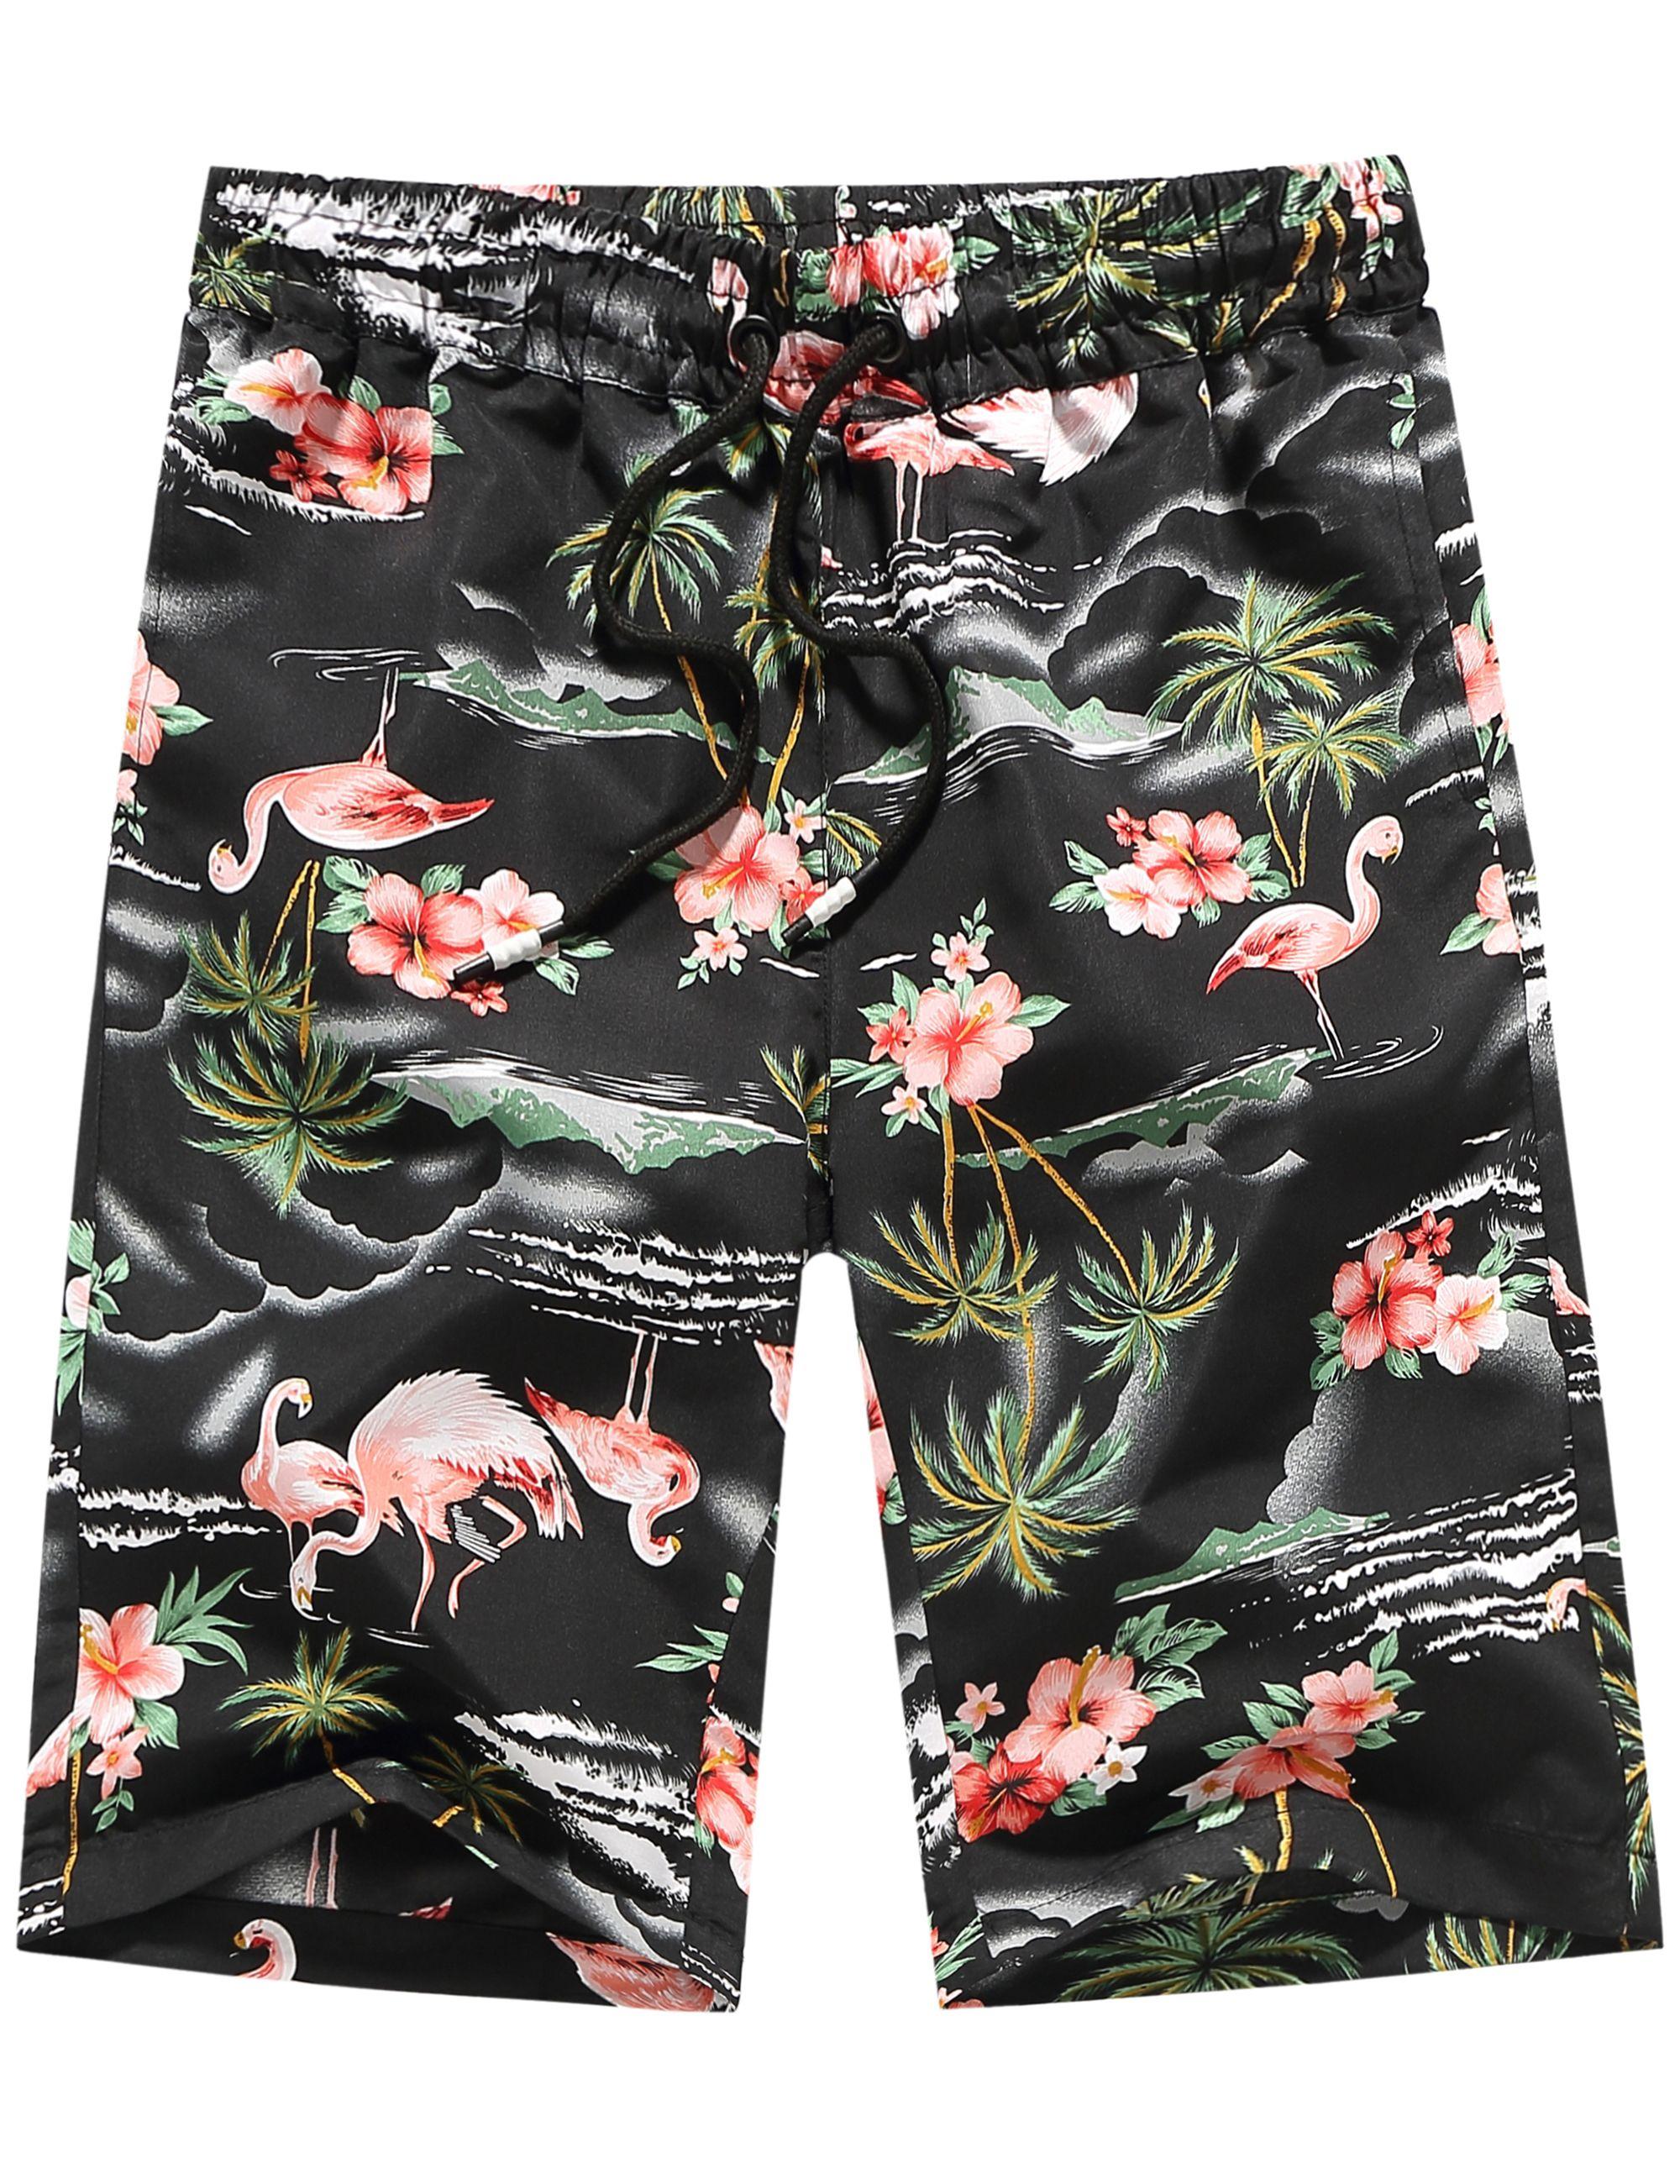 6ba7985ff7 $19.90 Men's Pink Flamingos Swimming Hawaiian Aloha Board Shorts ...